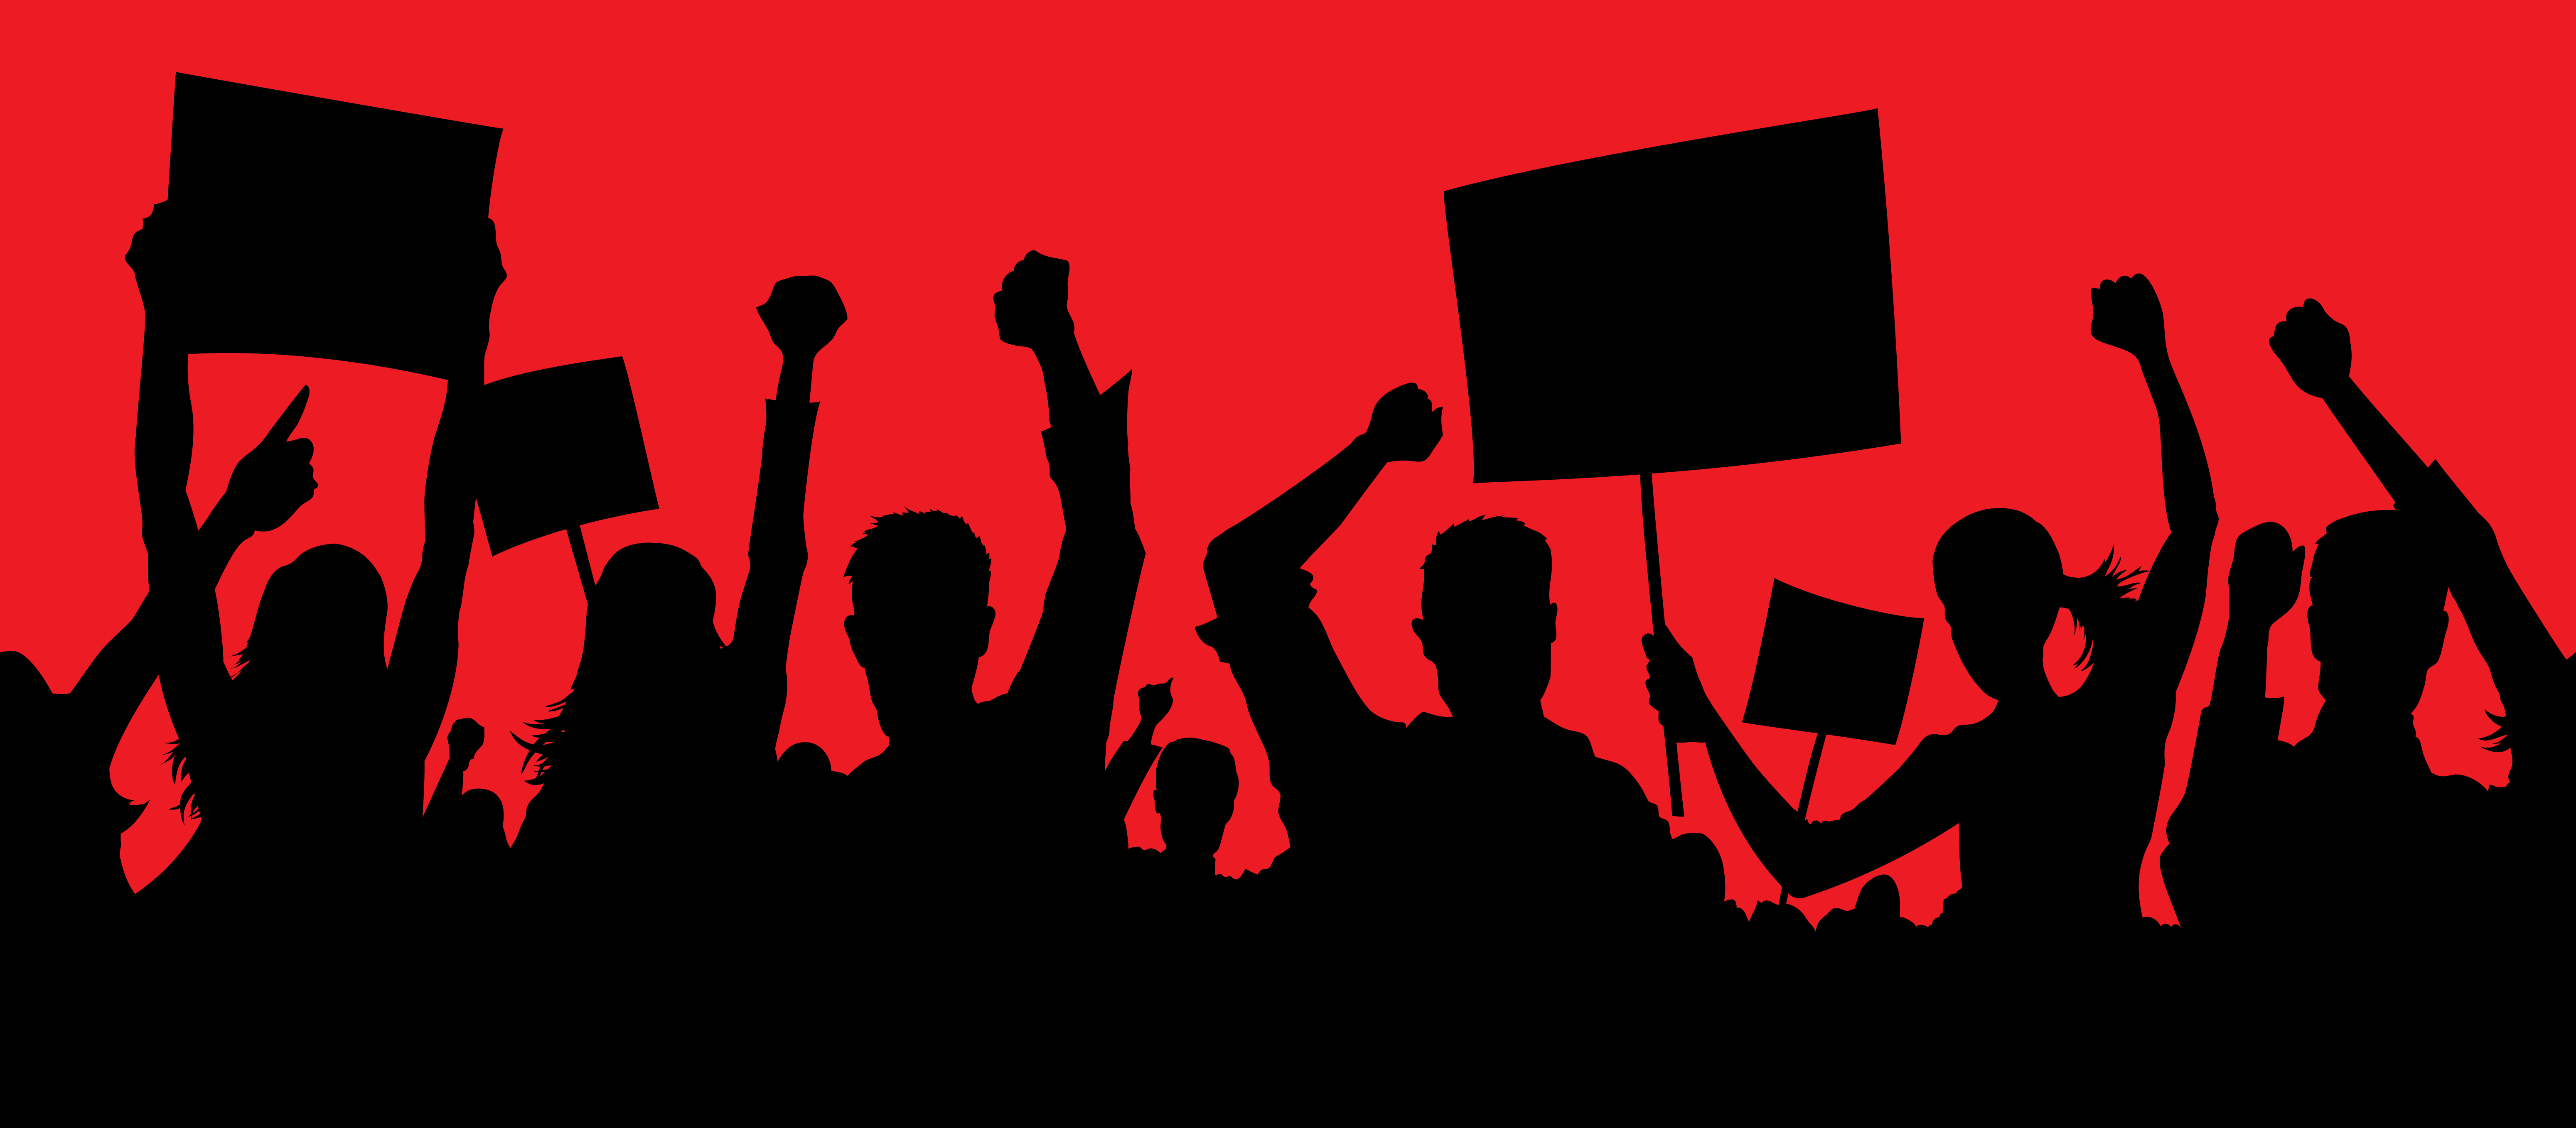 unions2-12-3-2016